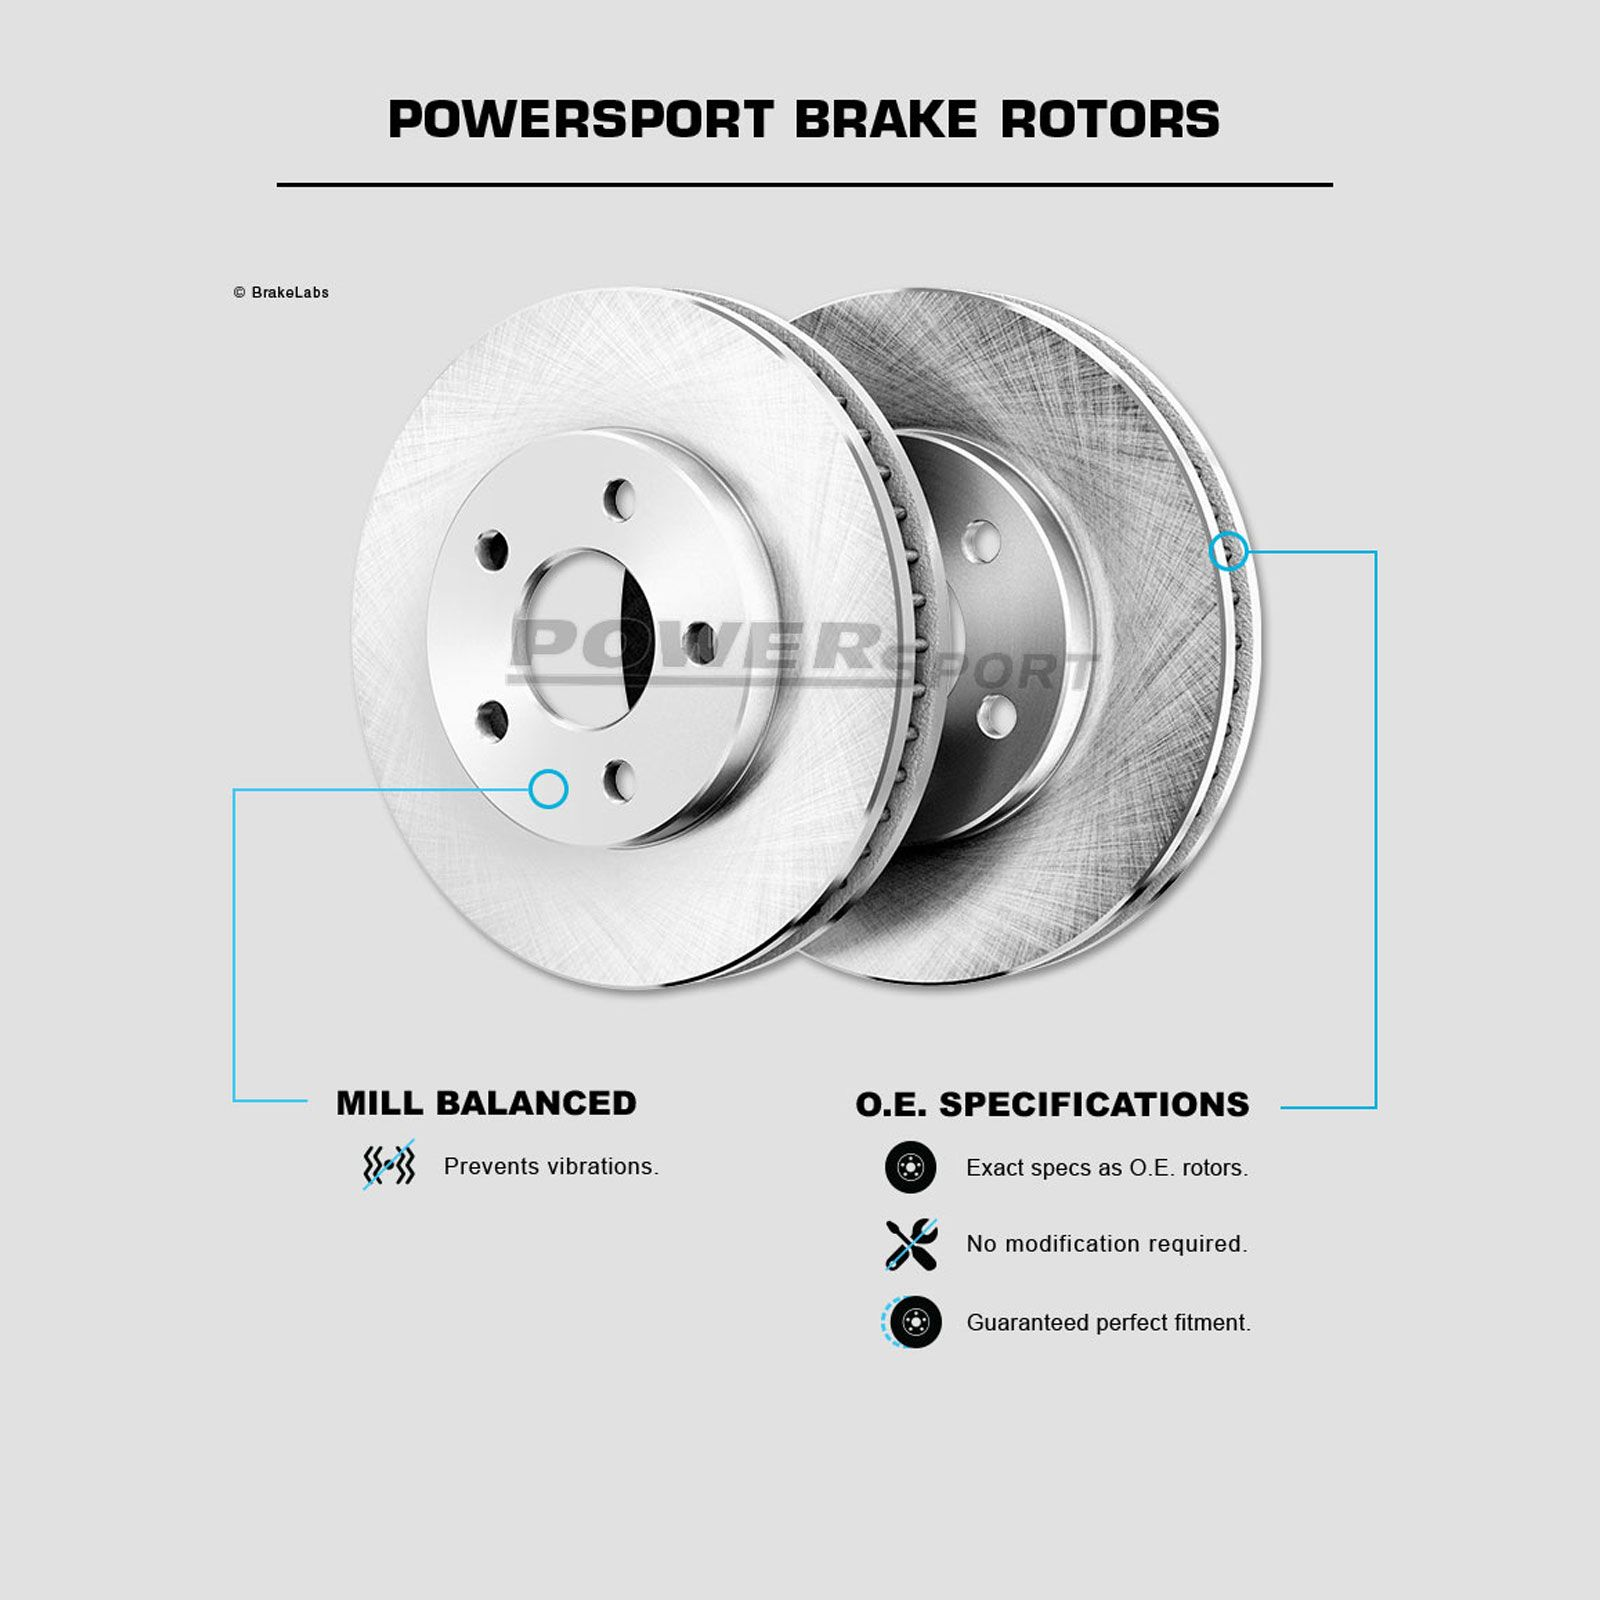 Ceramic Brake Pads Fit 2011 Mazda 2 Front PowerSport Blank Brake Rotors